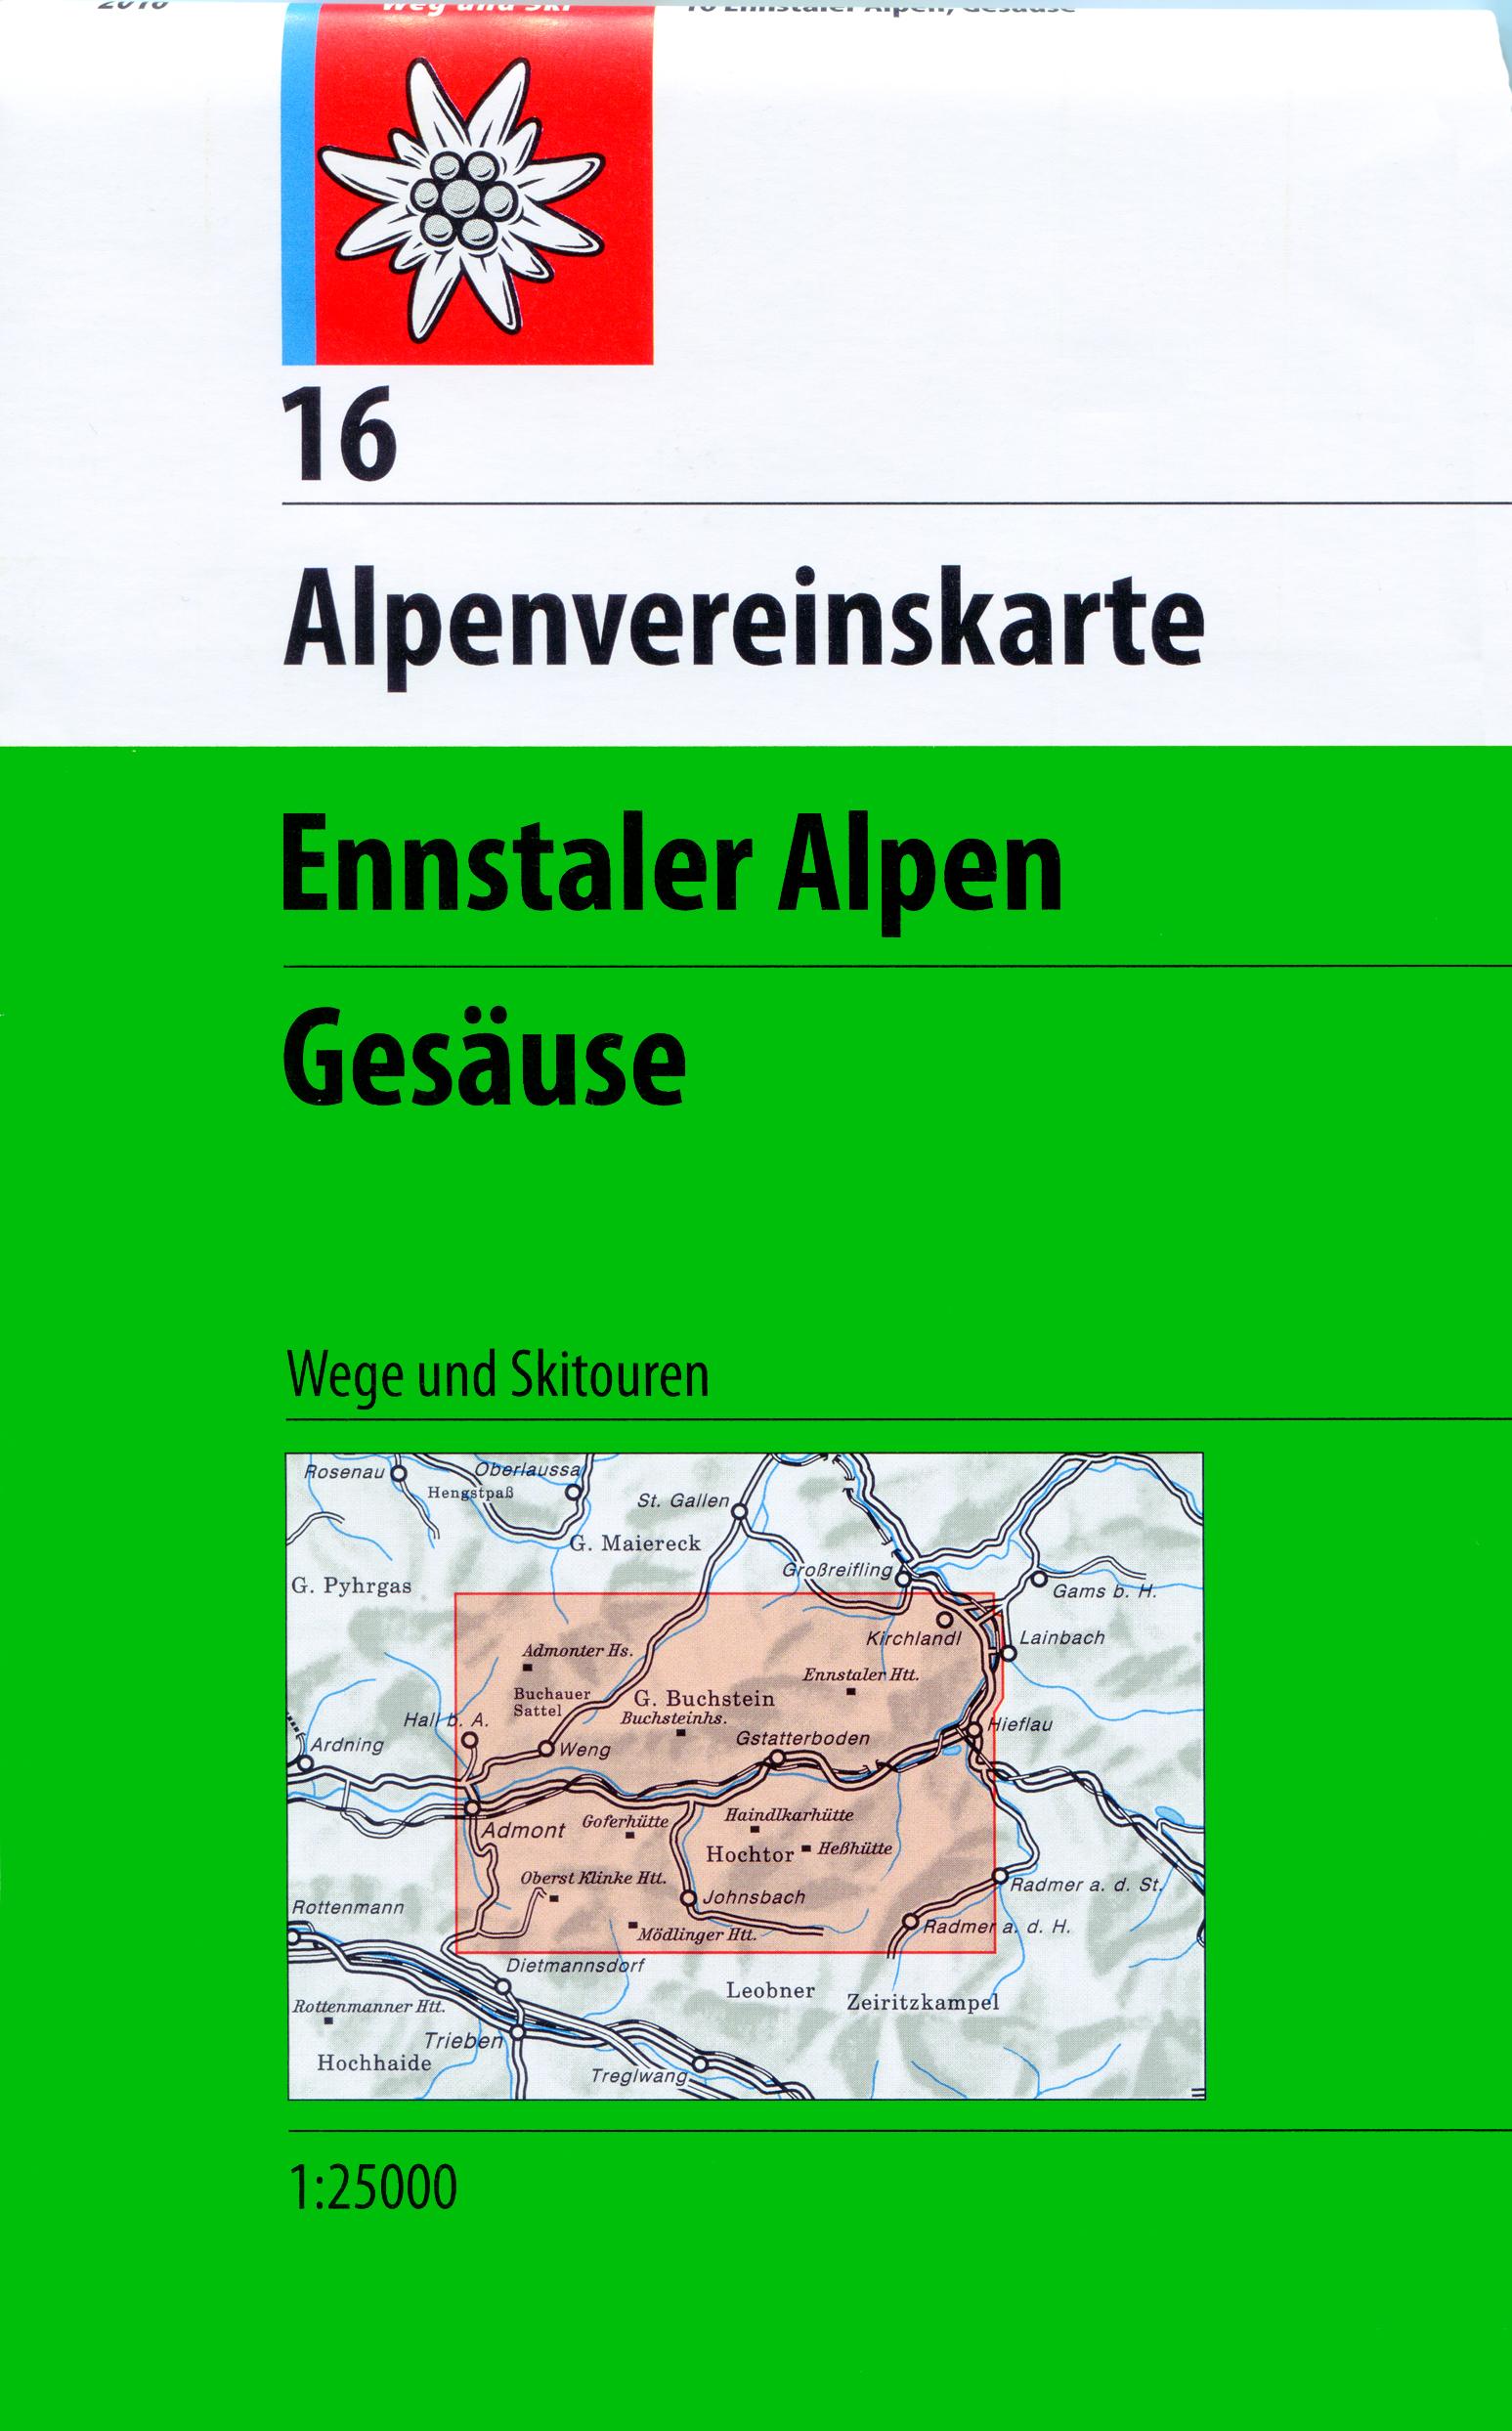 DAV Alpenvereinskarte 16 Ennstaler Alpen - Gesäuse 1 : 25 000,